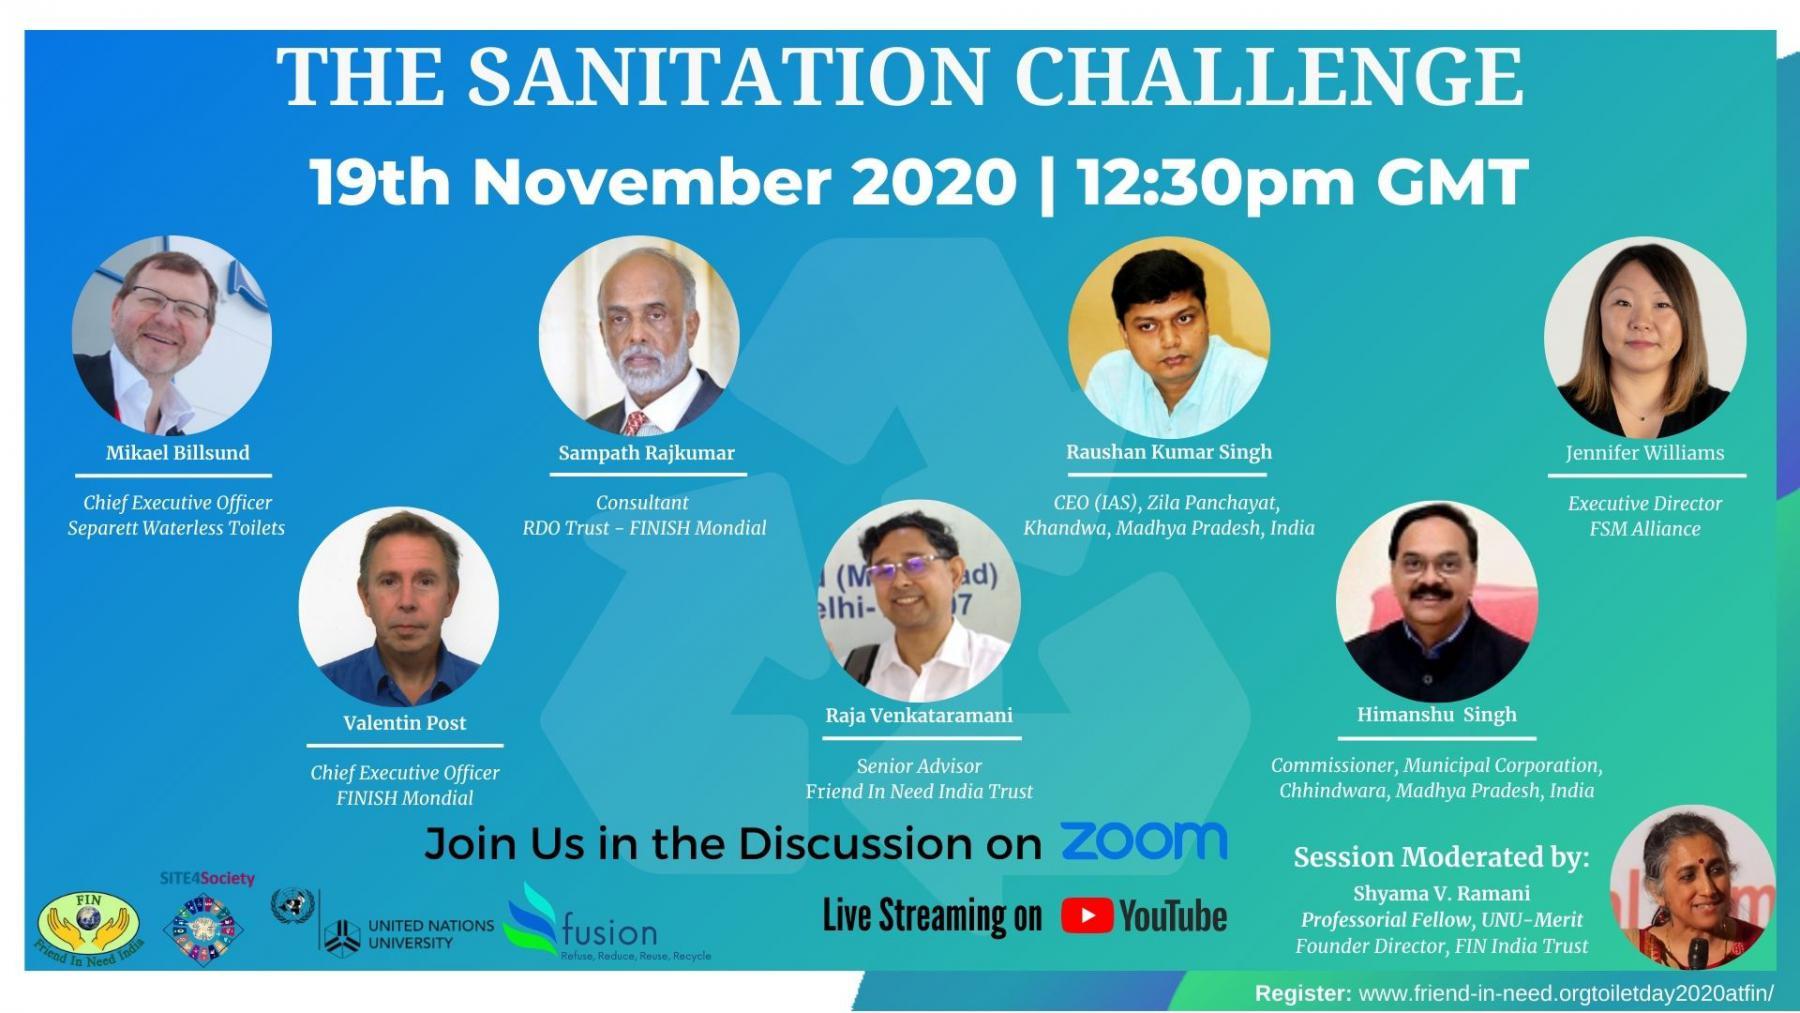 World Toilet Day 2020 Program Posters